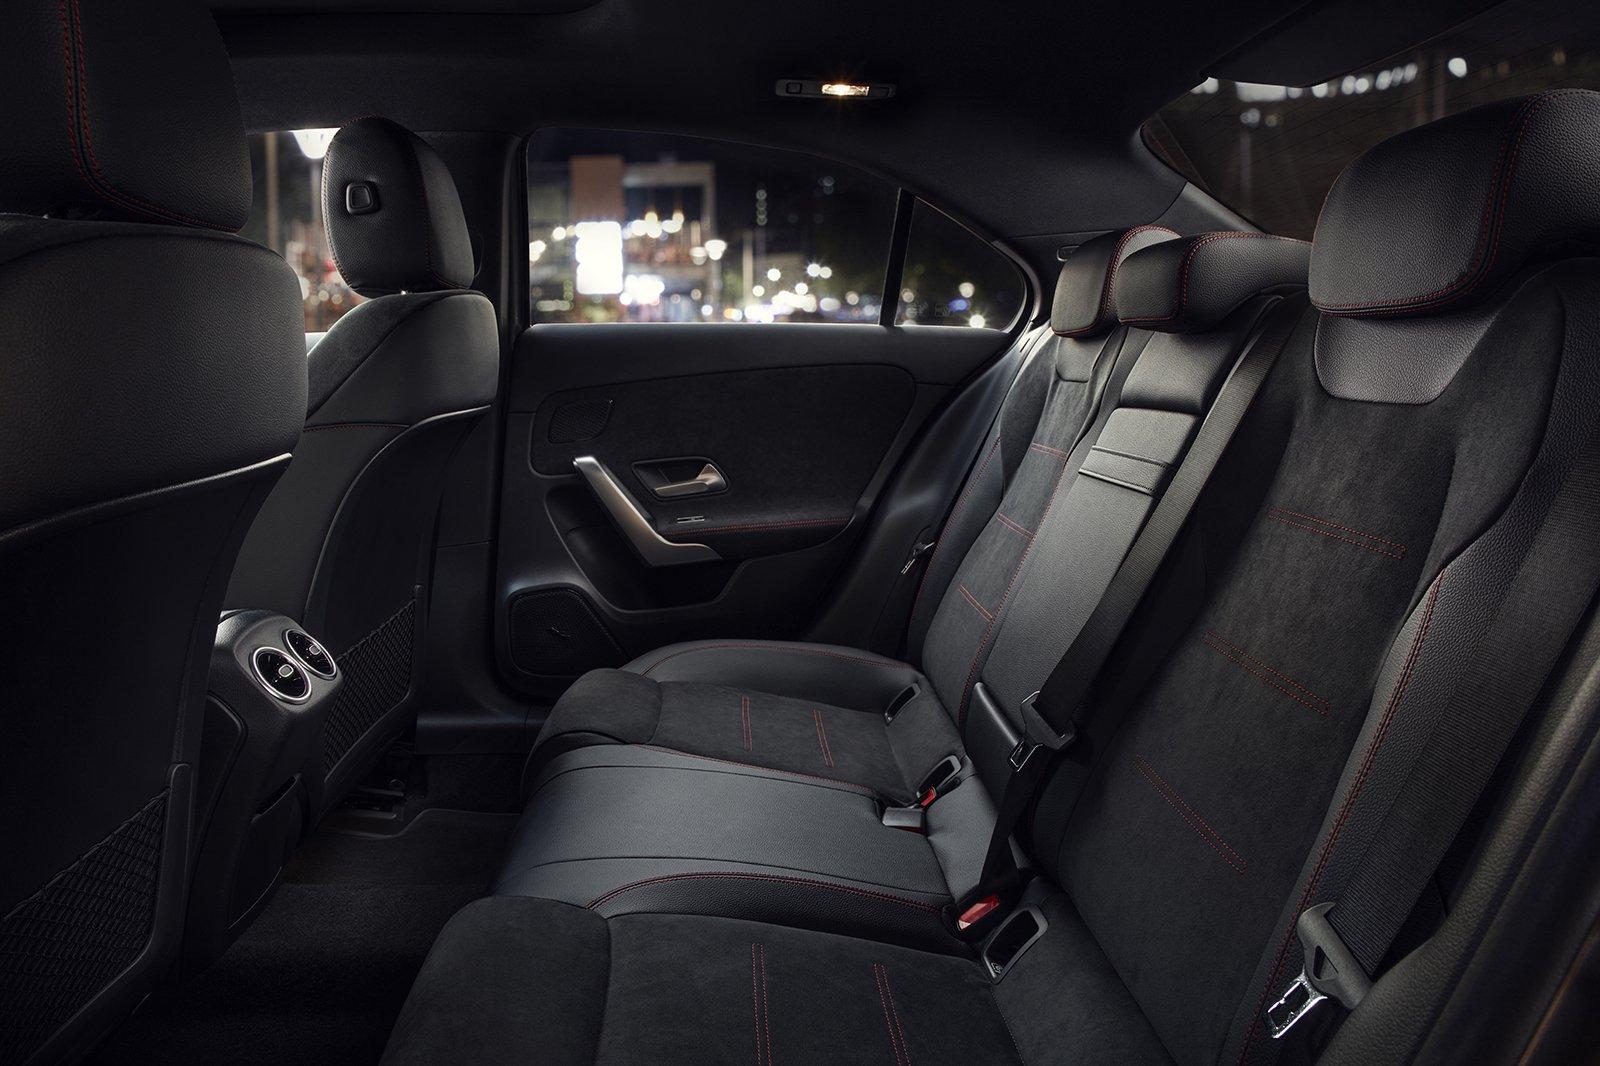 Mercedes A-Class Saloon 2020 rear seats